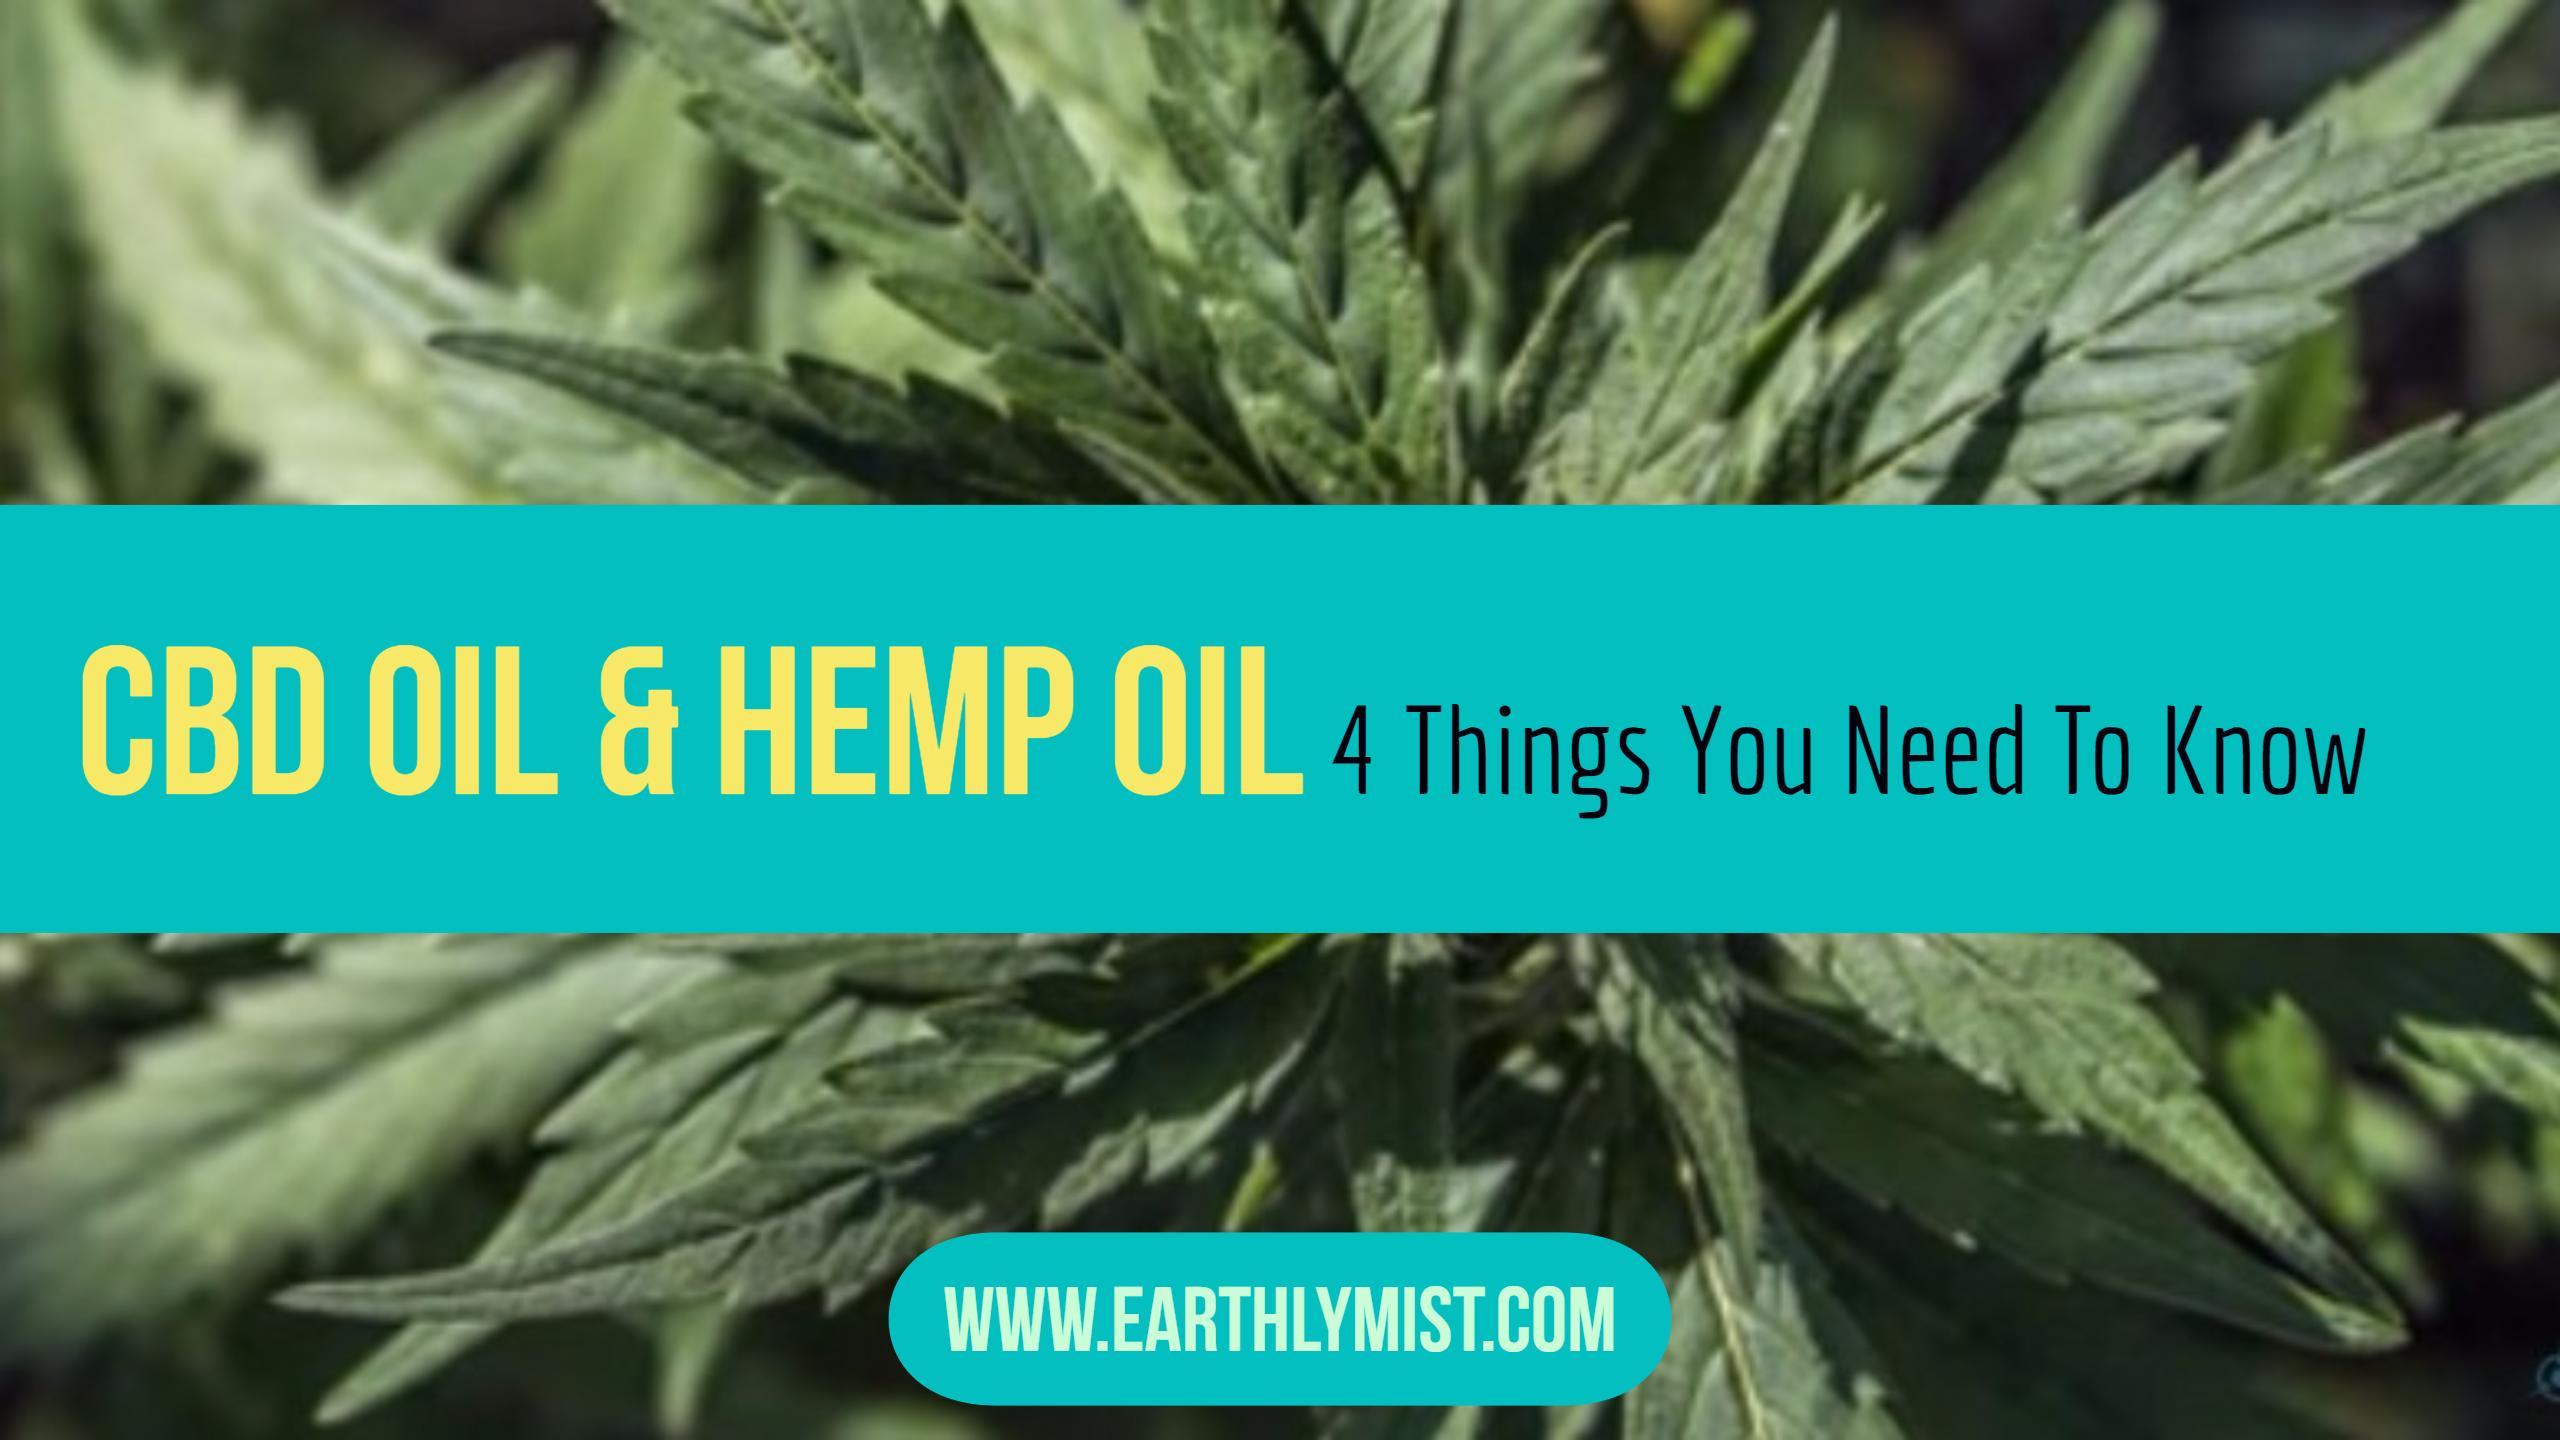 Hemp Oil vs CBD Cannabis: OIl Benefits and Uses